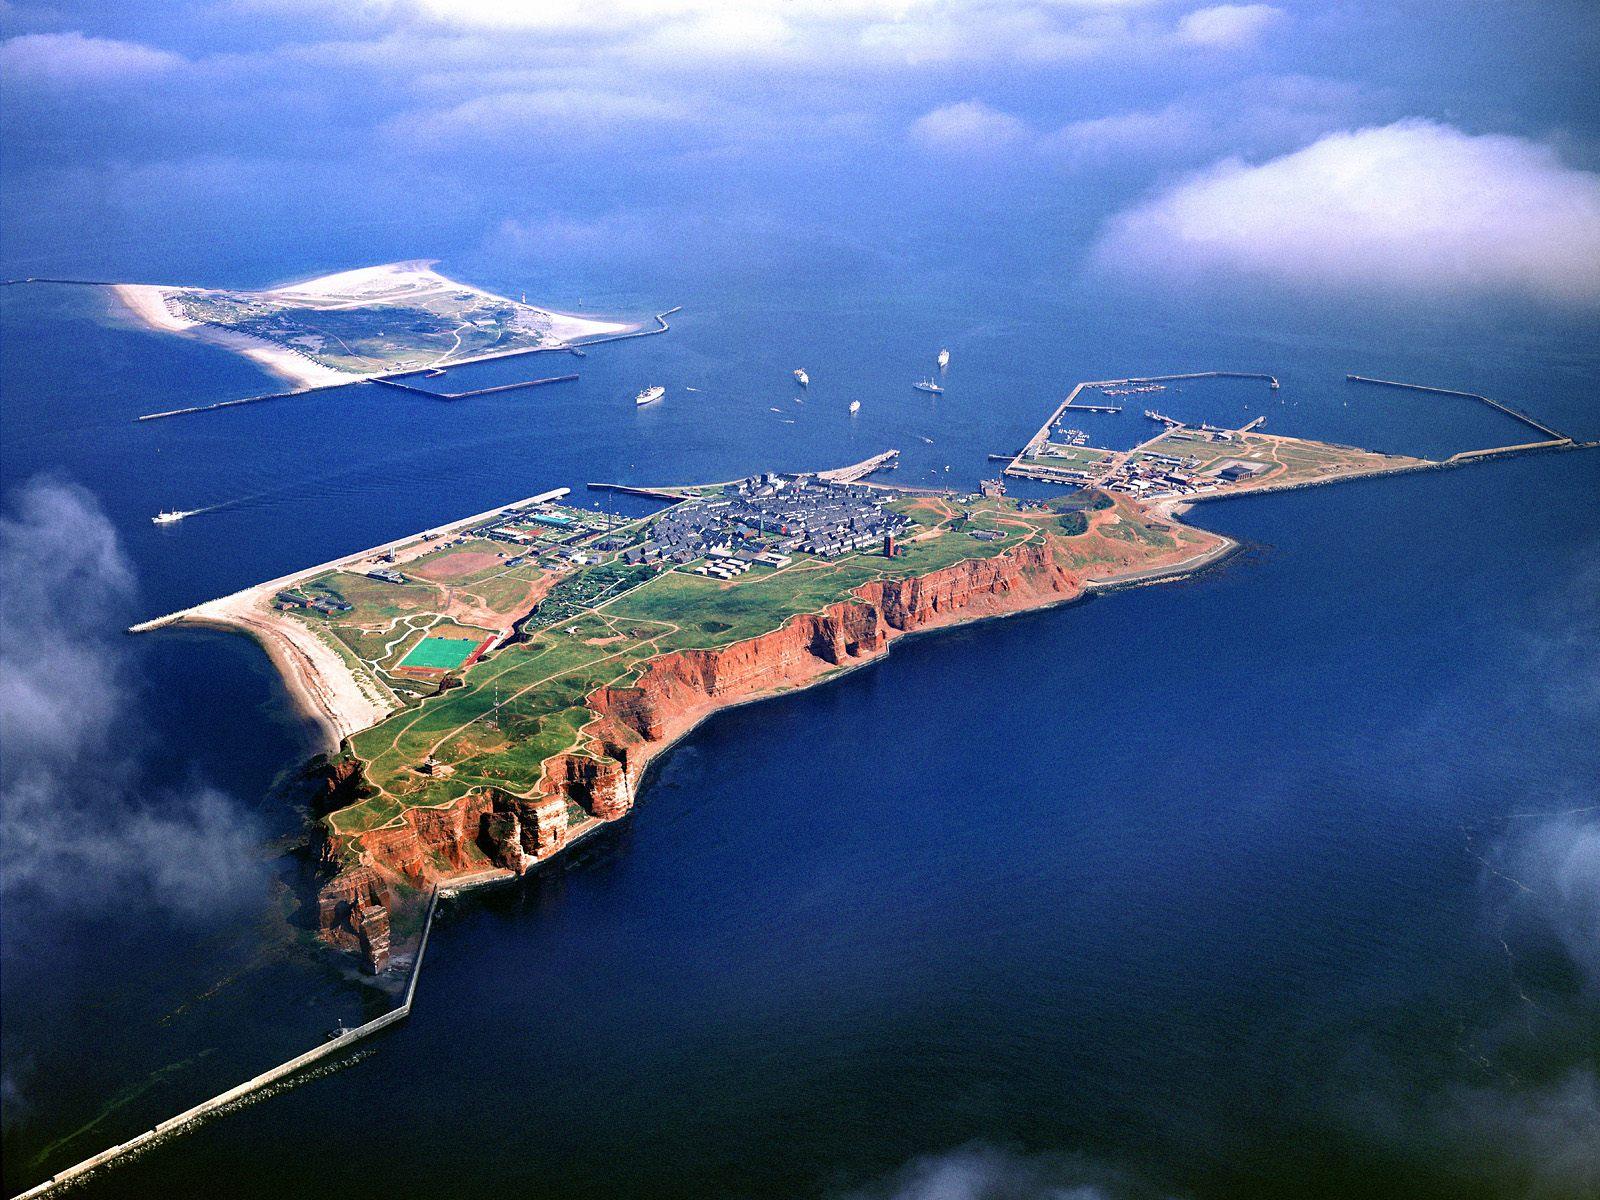 Heligoland pulau jerman yang ingin dilenyapkan inggris terselubung